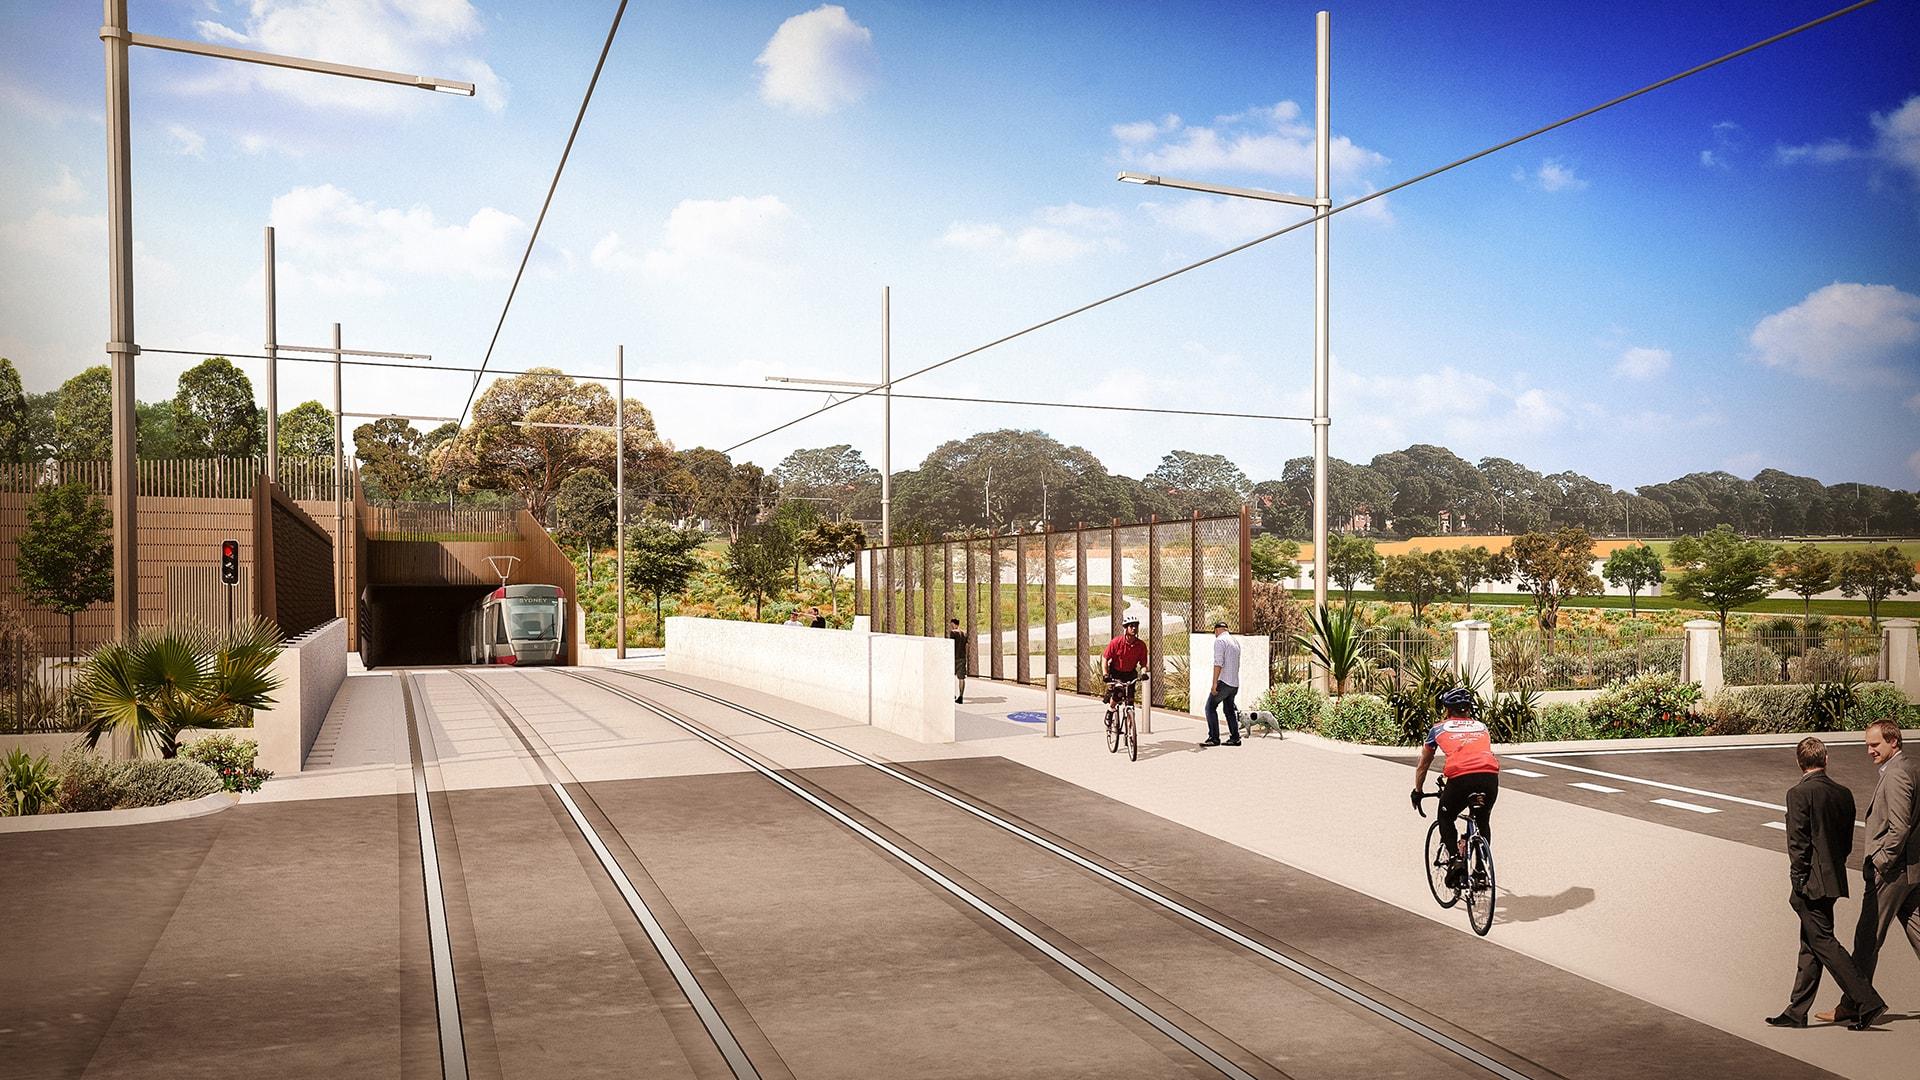 sydney-light-rail-ppp-main-image-min